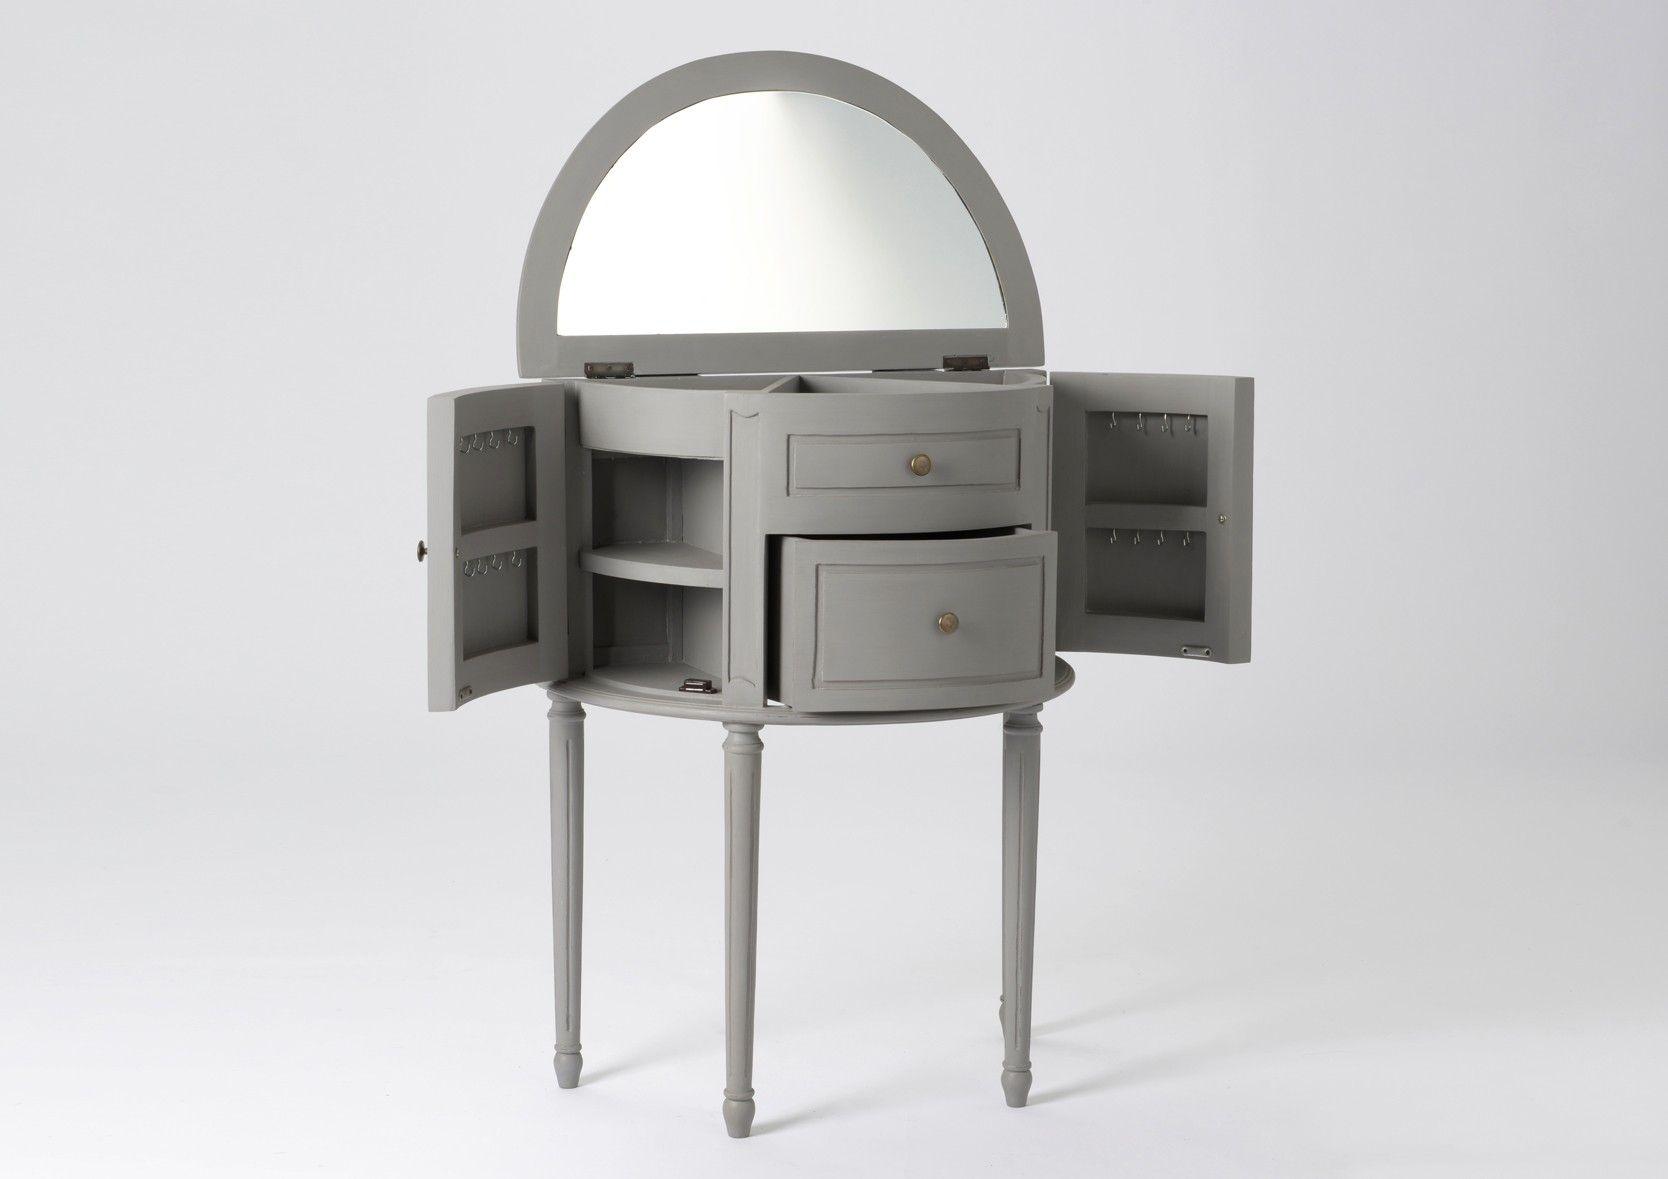 Muebles Macabane - C Mo Conseguir El Dormitorio Perfecto Para Un Decolover Con El [mjhdah]https://i.pinimg.com/736x/67/ed/24/67ed24b0a81984a0a86cdbe7b8c239f7.jpg